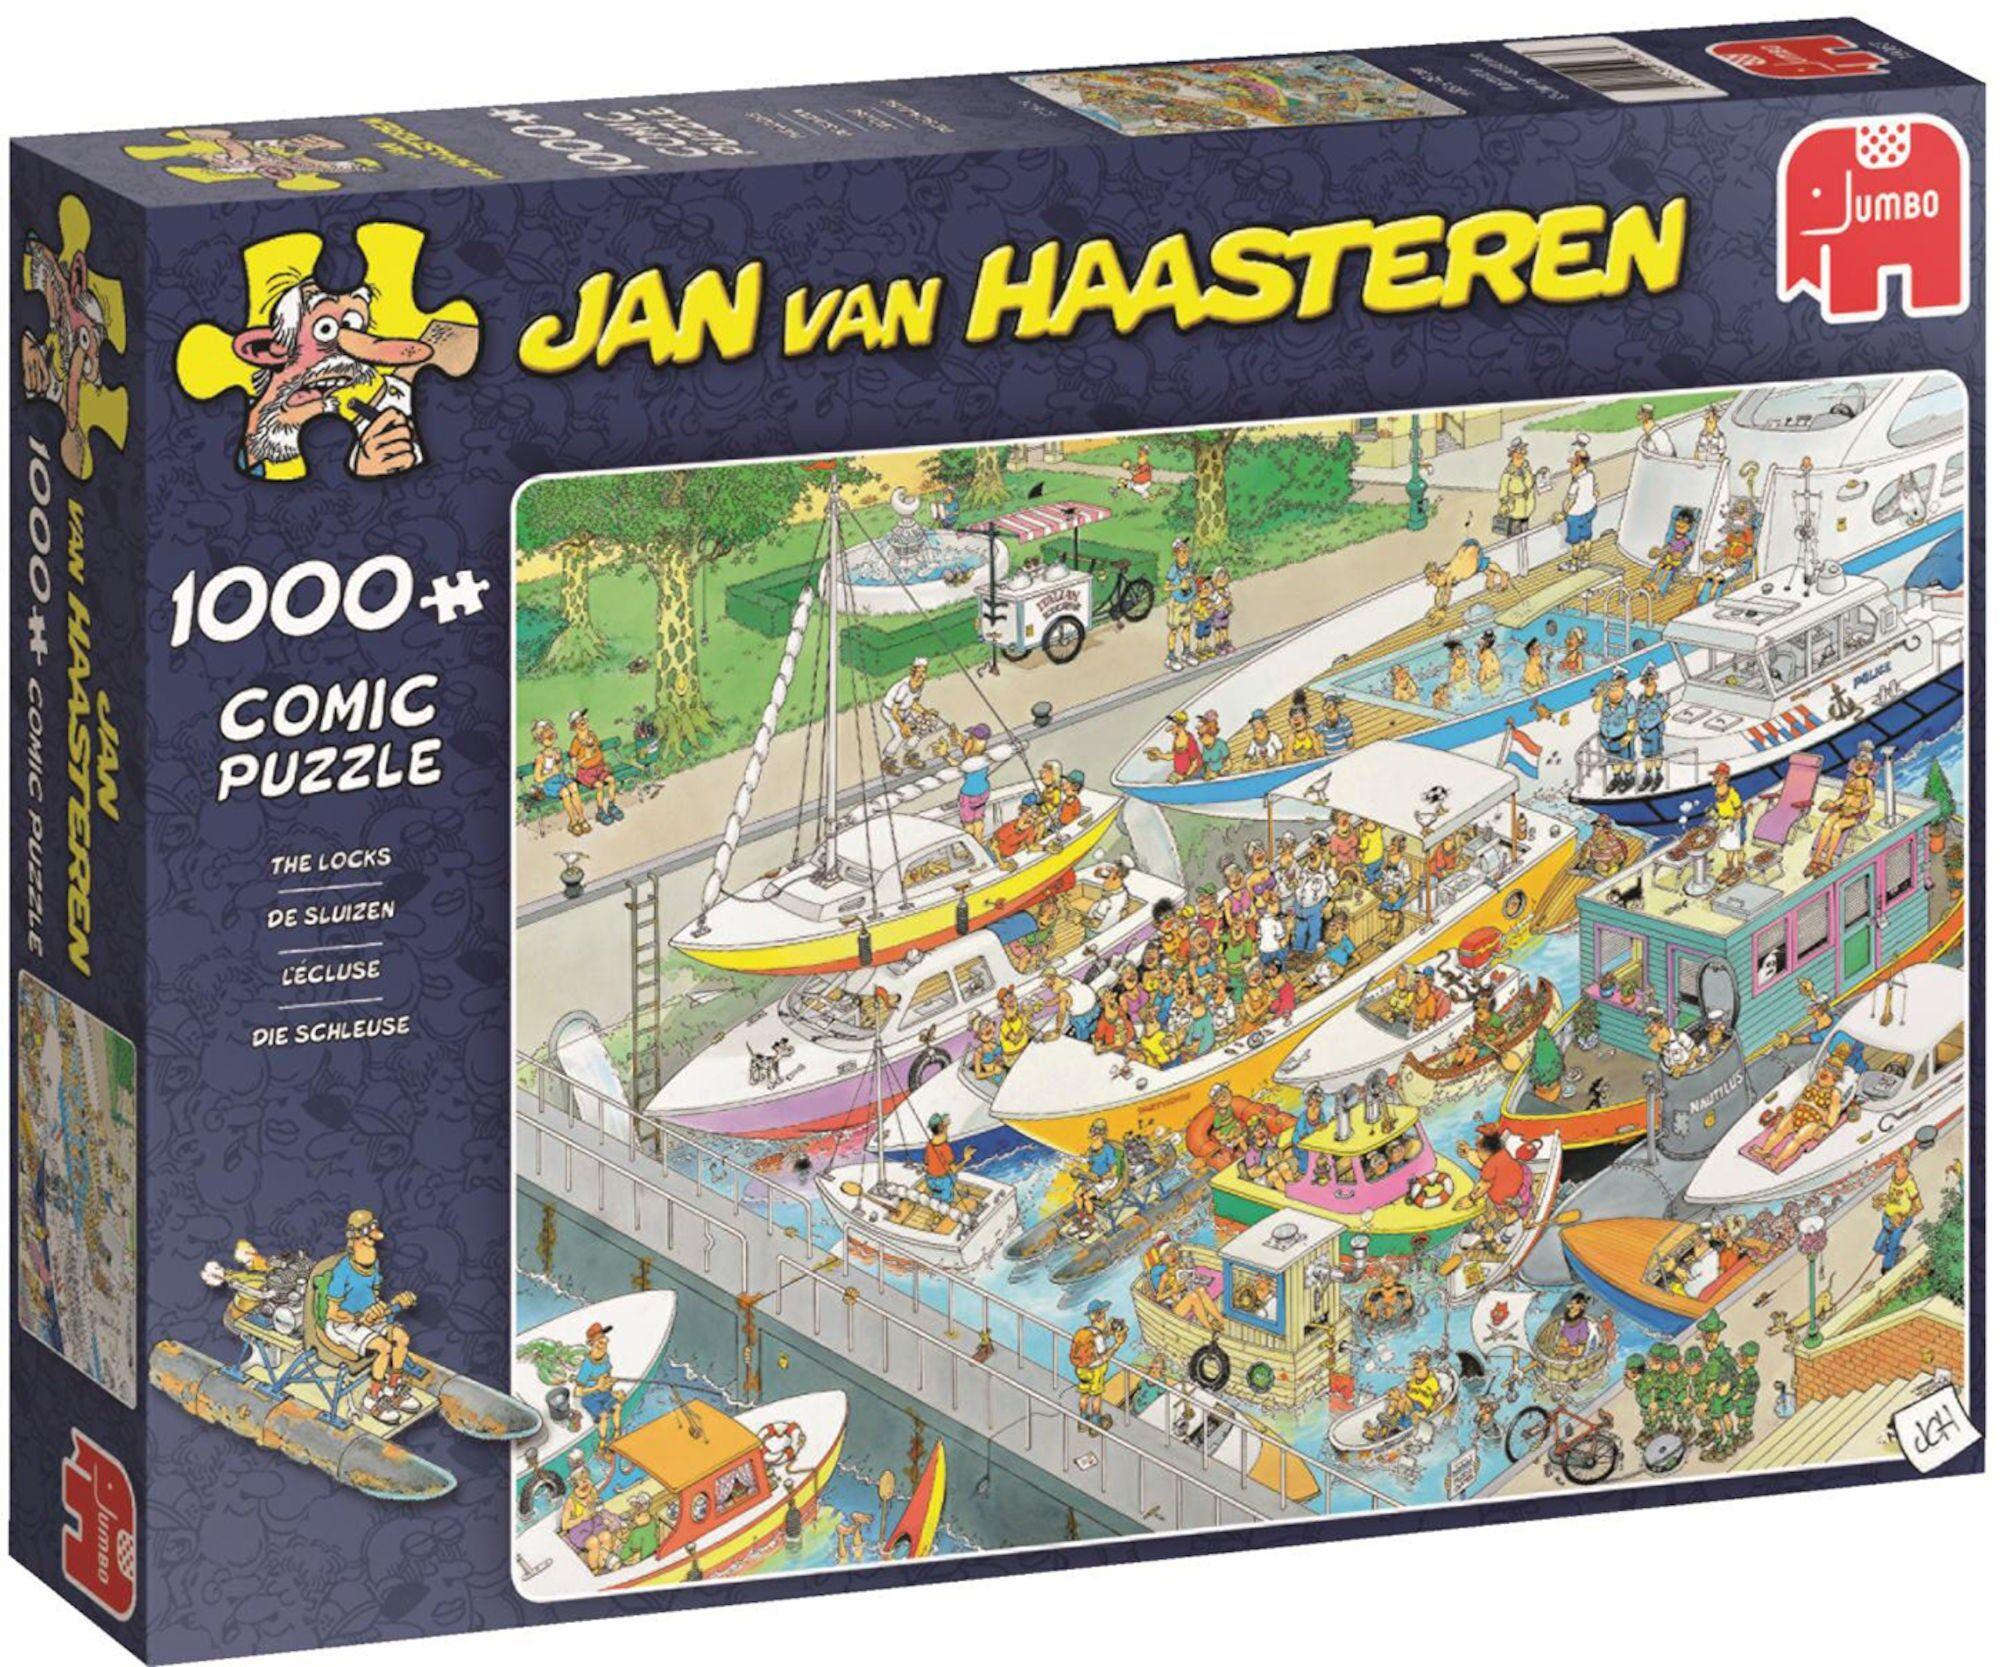 Jumbo Puslespill Jan van Haasteren The Locks 1000